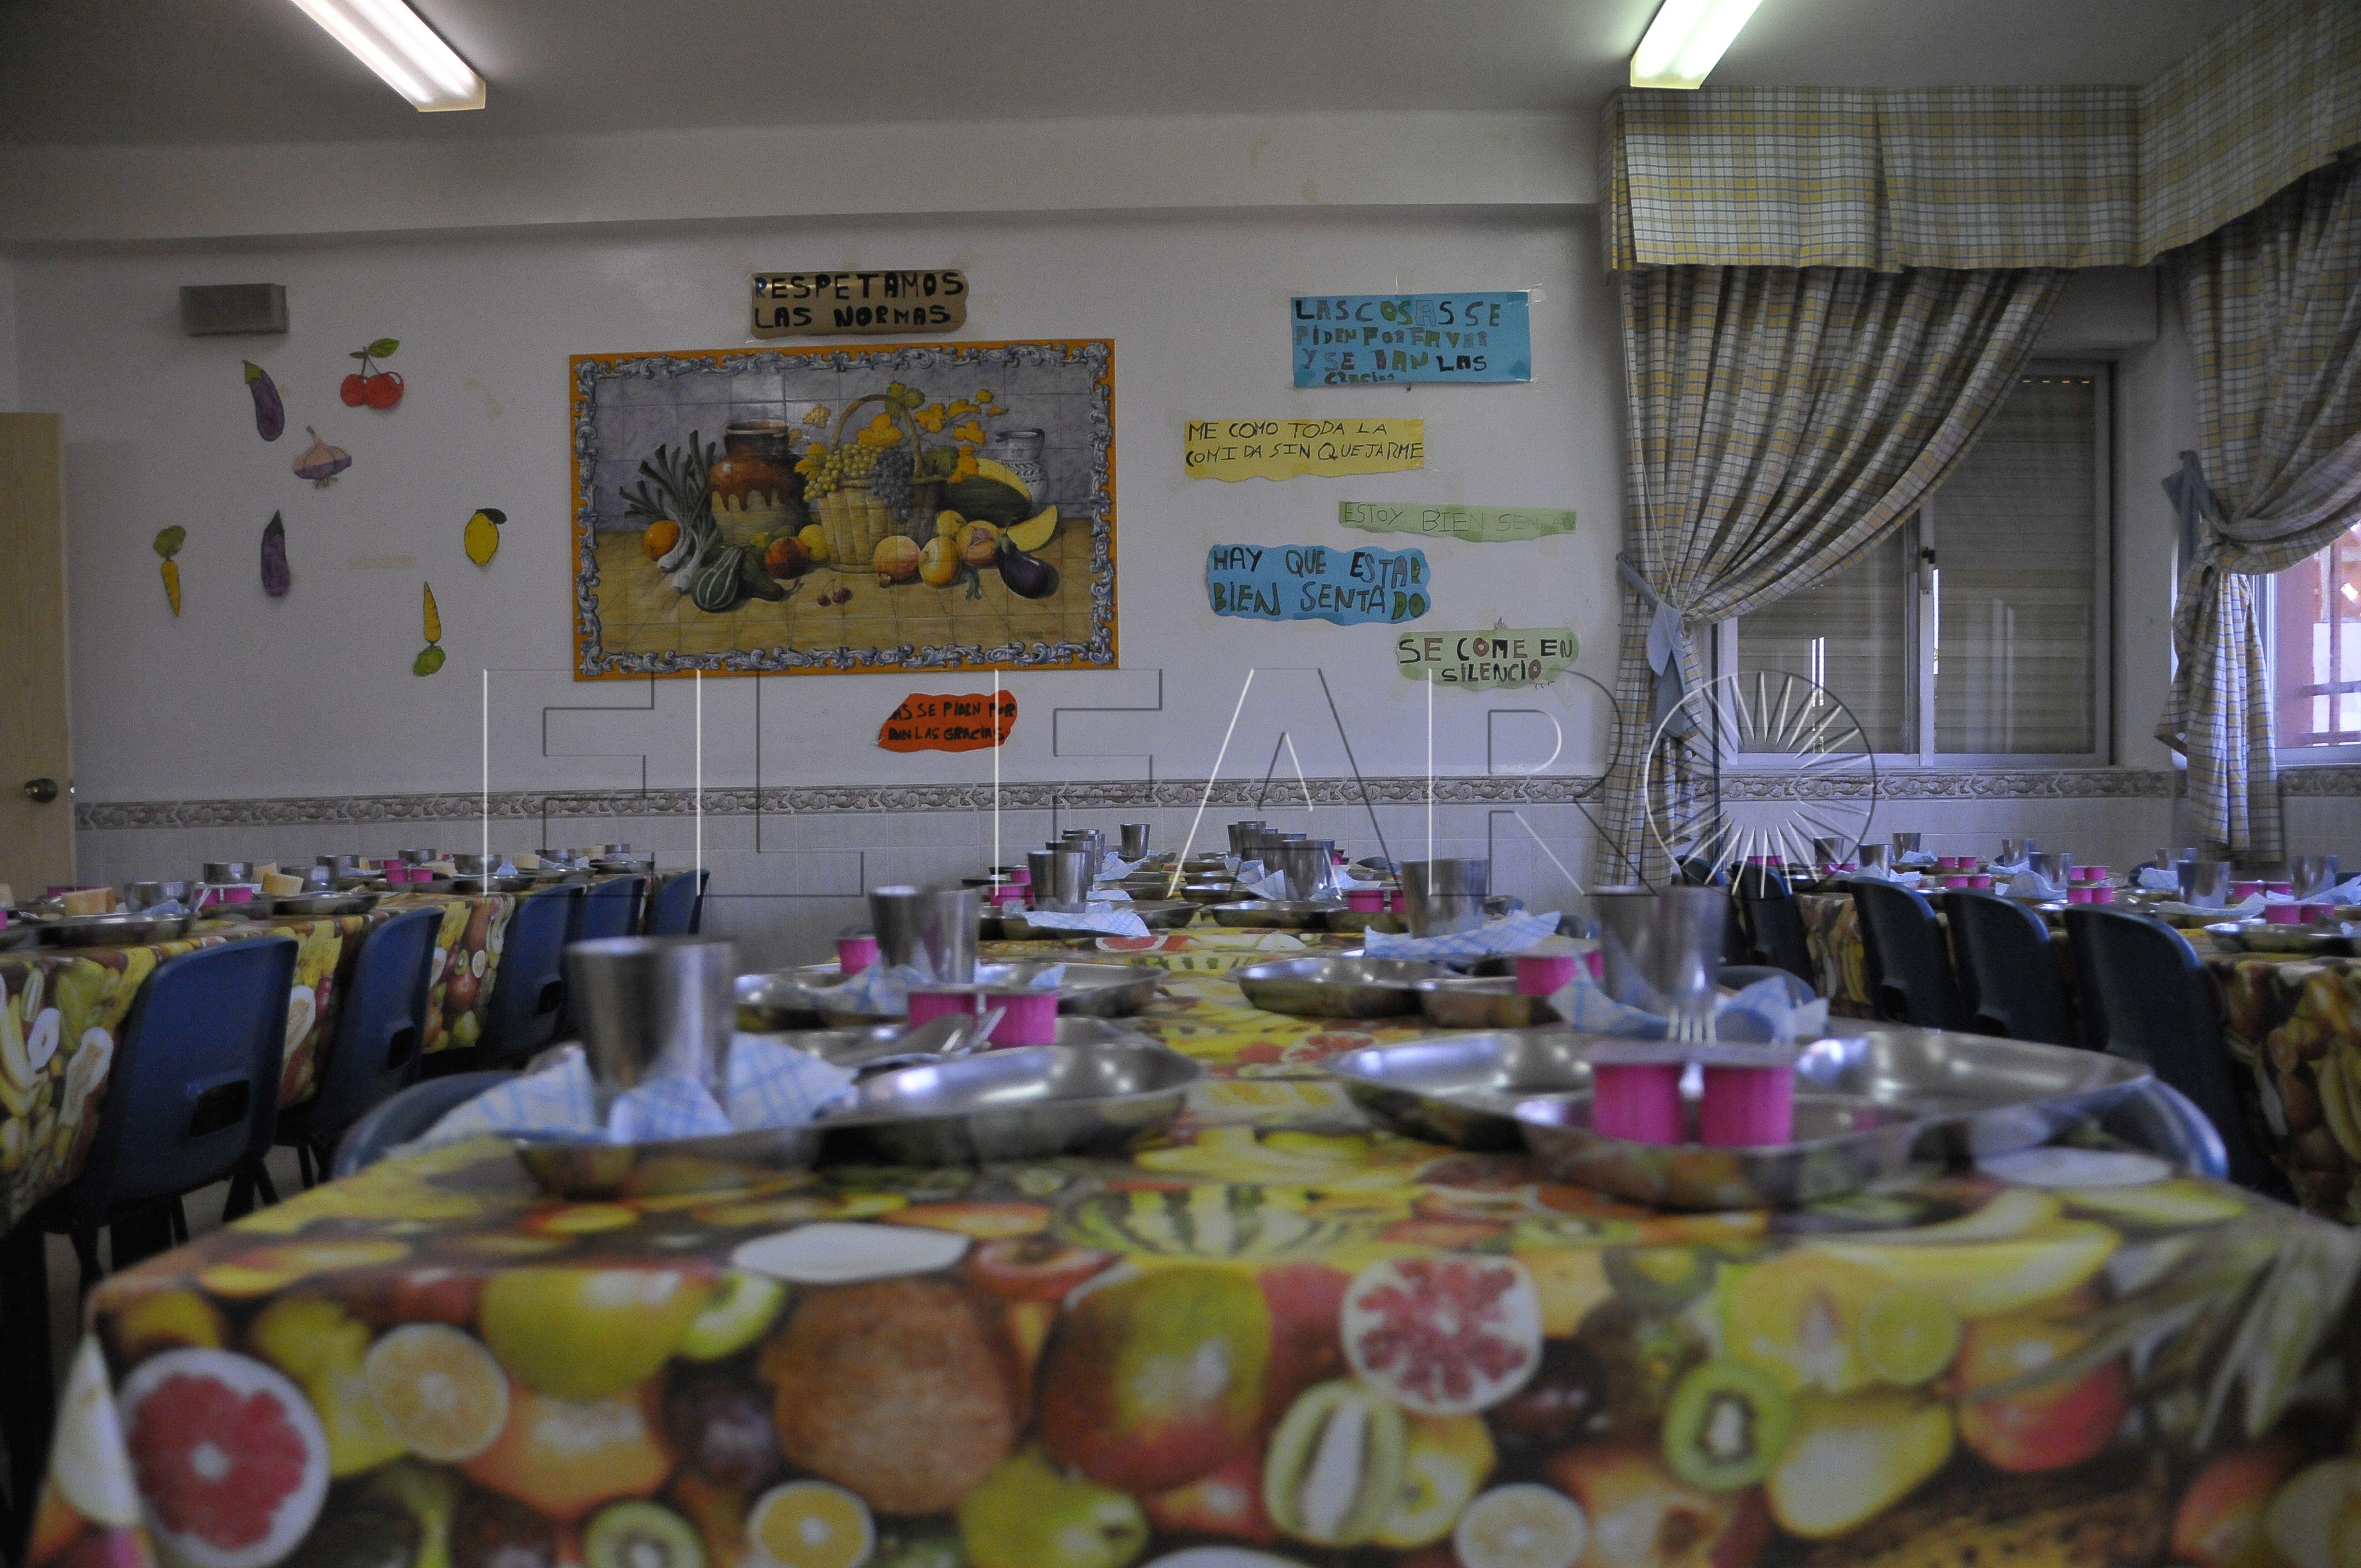 Delegación dice que 1.100 alumnos comerán este curso en los siete centros que disponen de comedor escolar